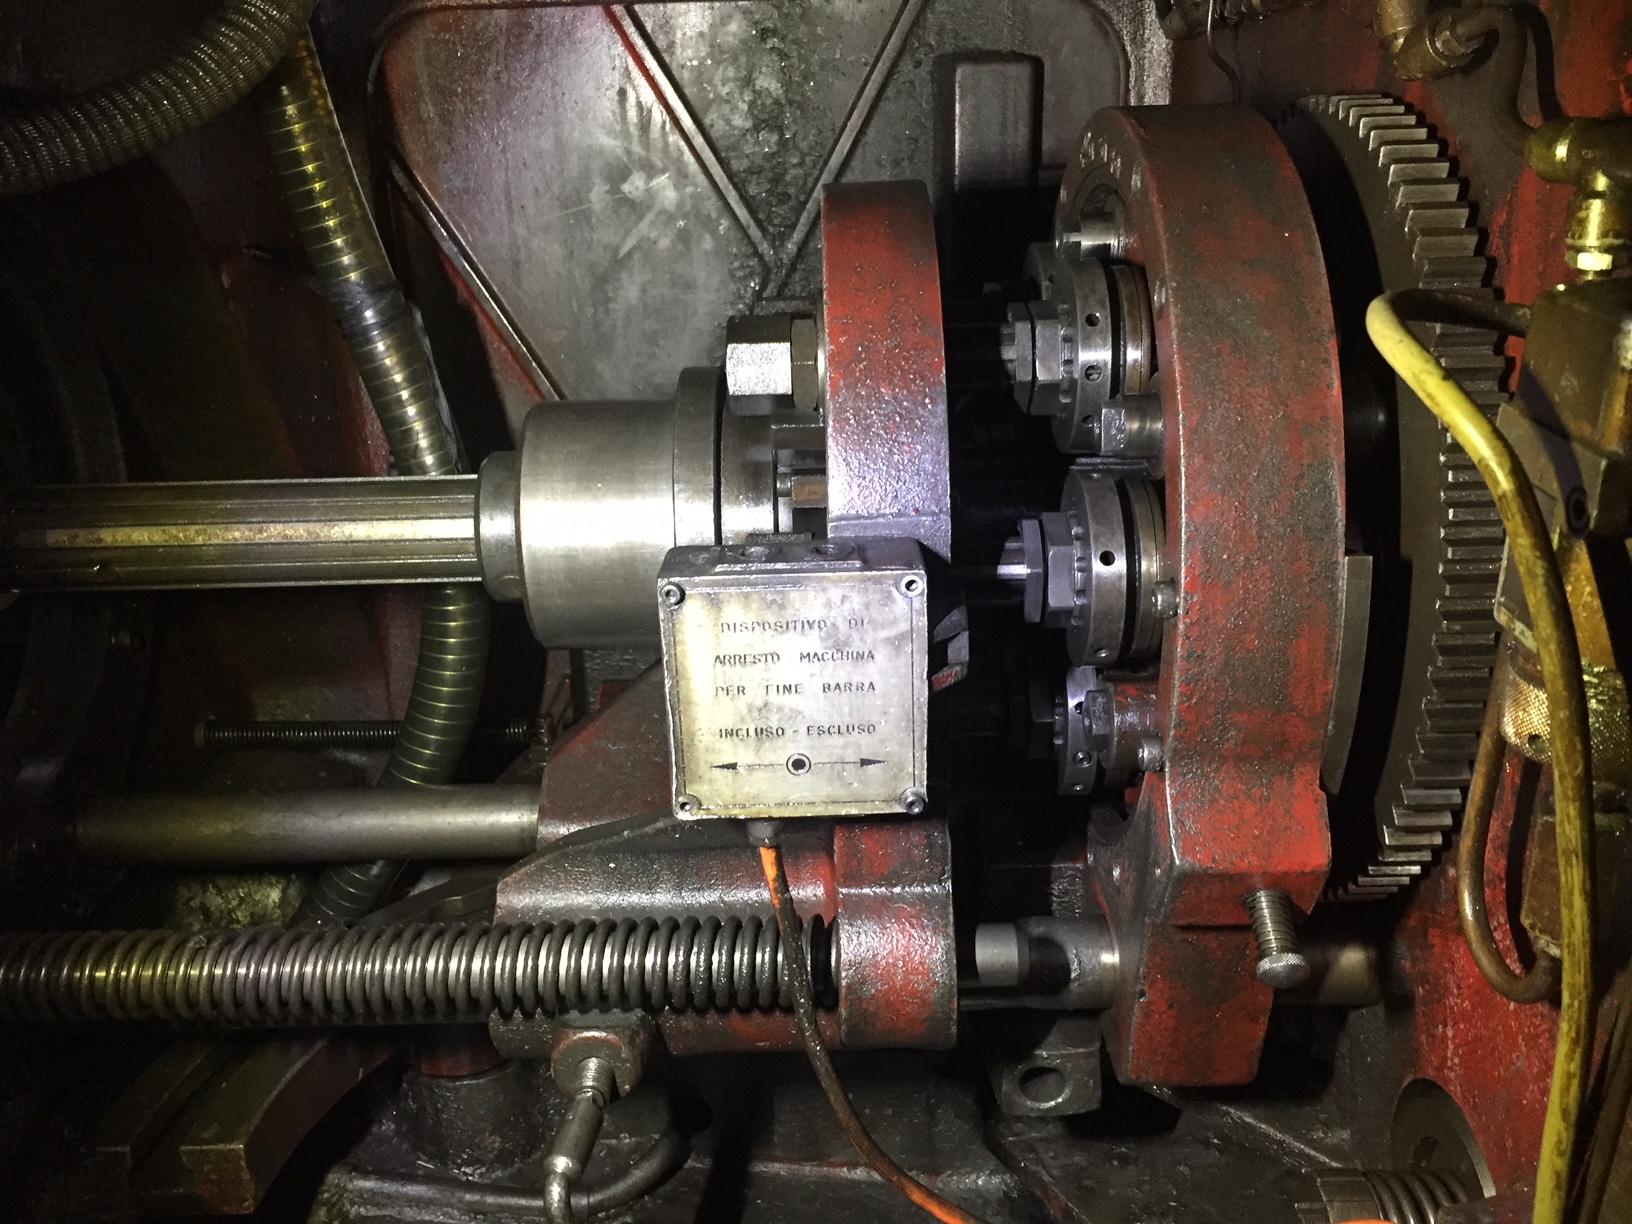 Lot 19 - Gildemeister Model IMIS 620, 6-Spindle Automatic Lathe